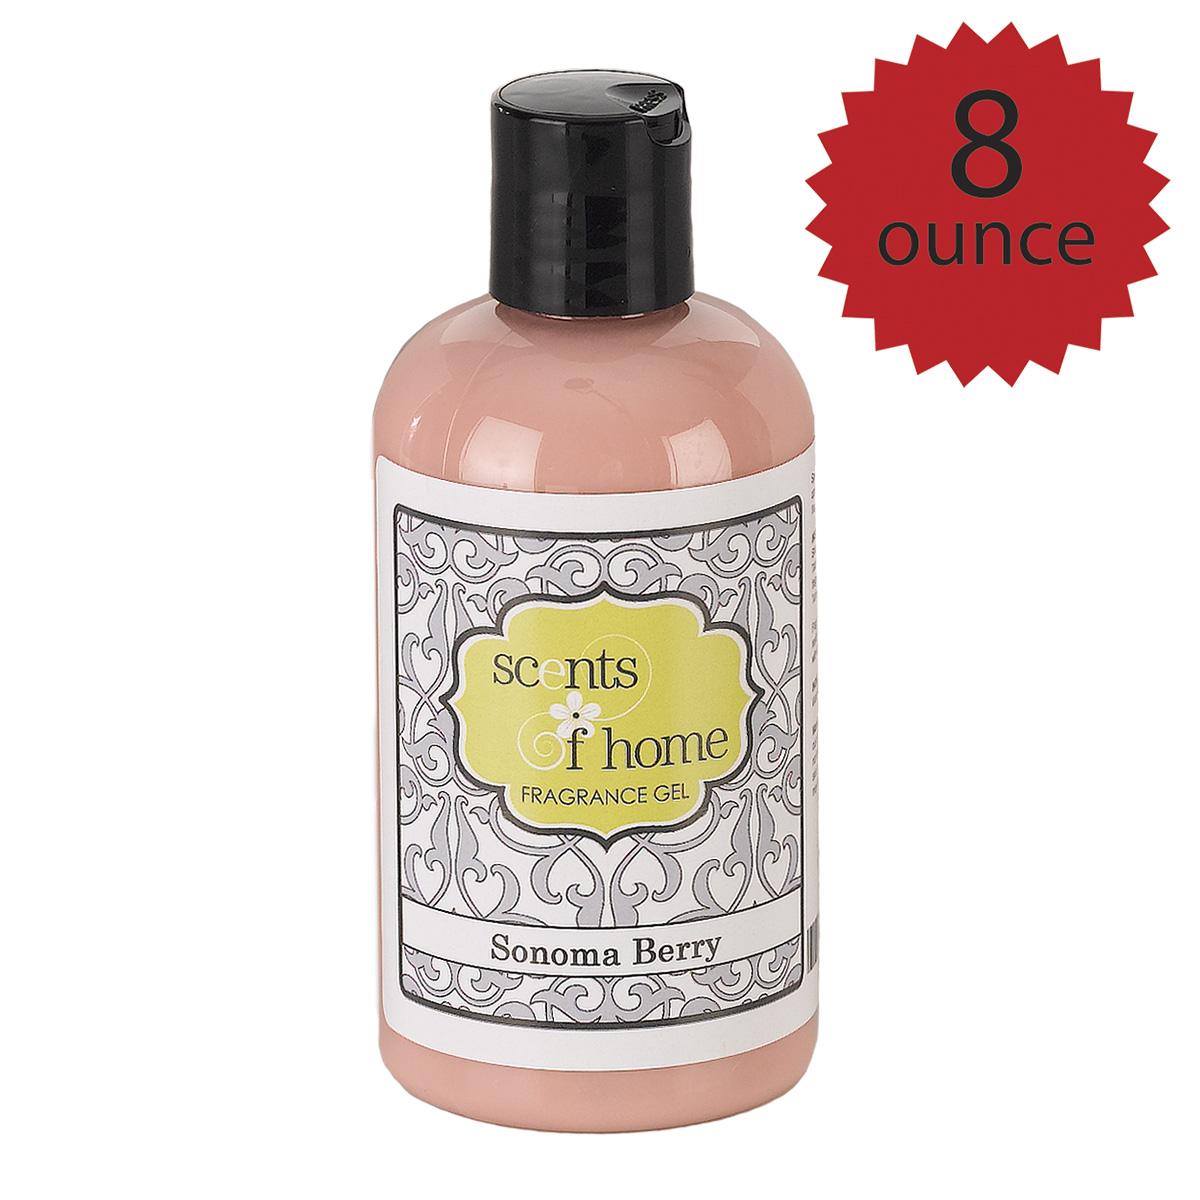 8 oz. Fragrance Gel - Sonoma Berry